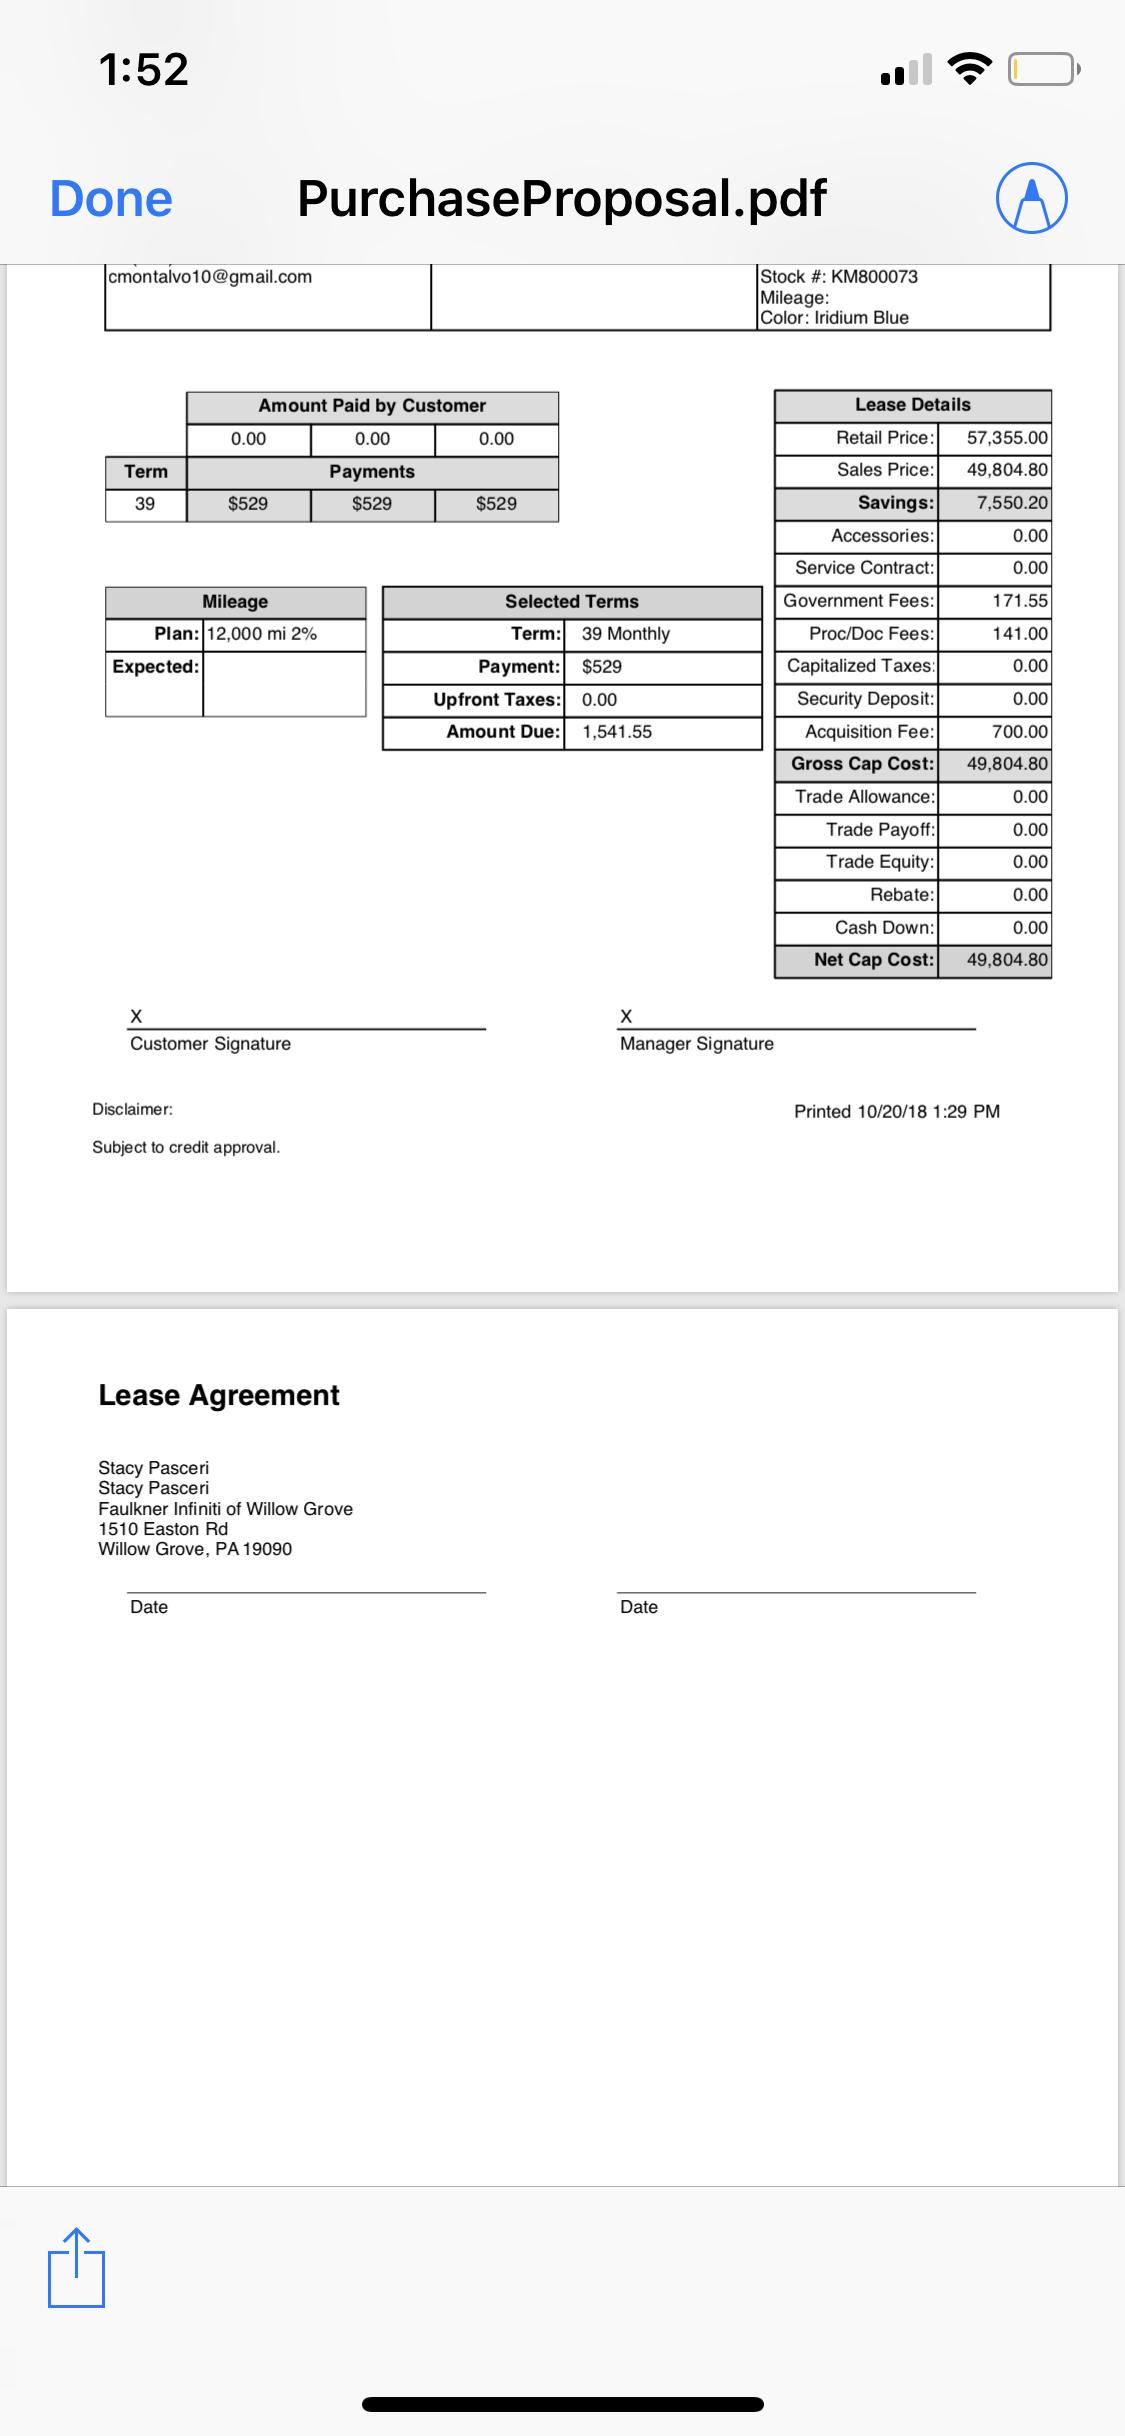 Infiniti Q50 Lease Deals >> 2019 Infiniti Q50 Lease Deals and Prices — Car Forums at Edmunds.com